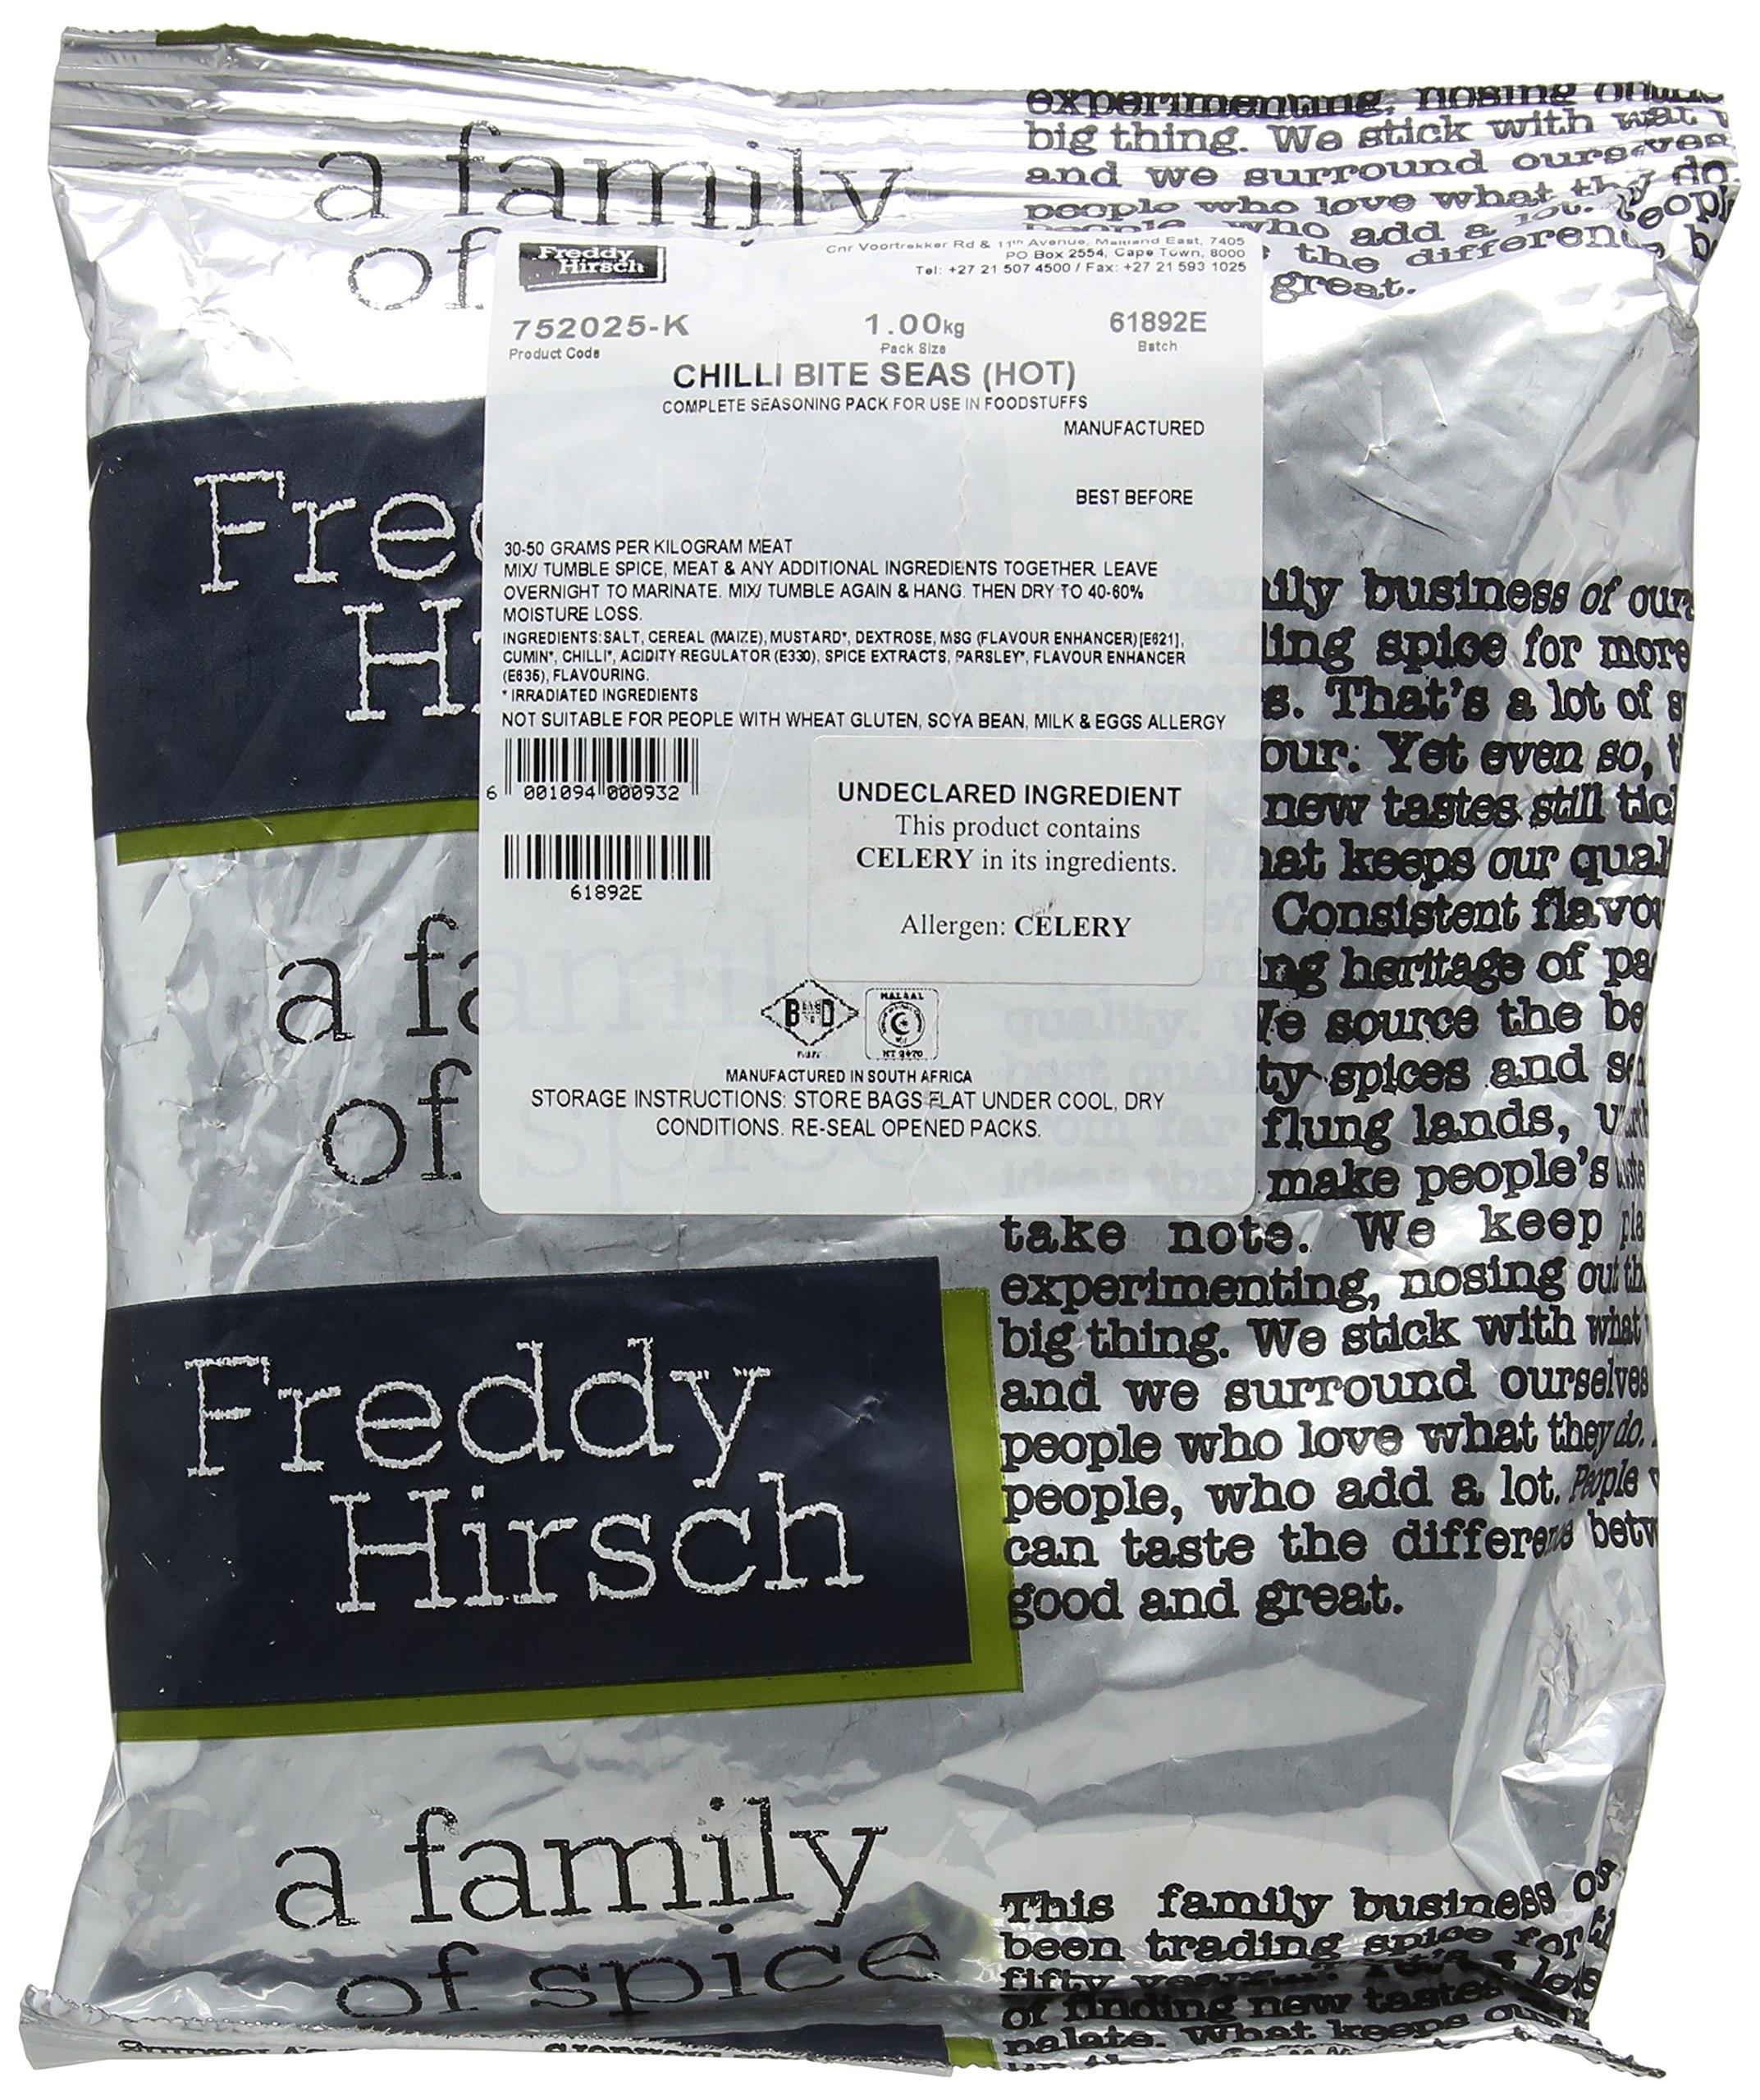 Freddy Hirsch Chilli Bite Hot Seasoning 1 kg